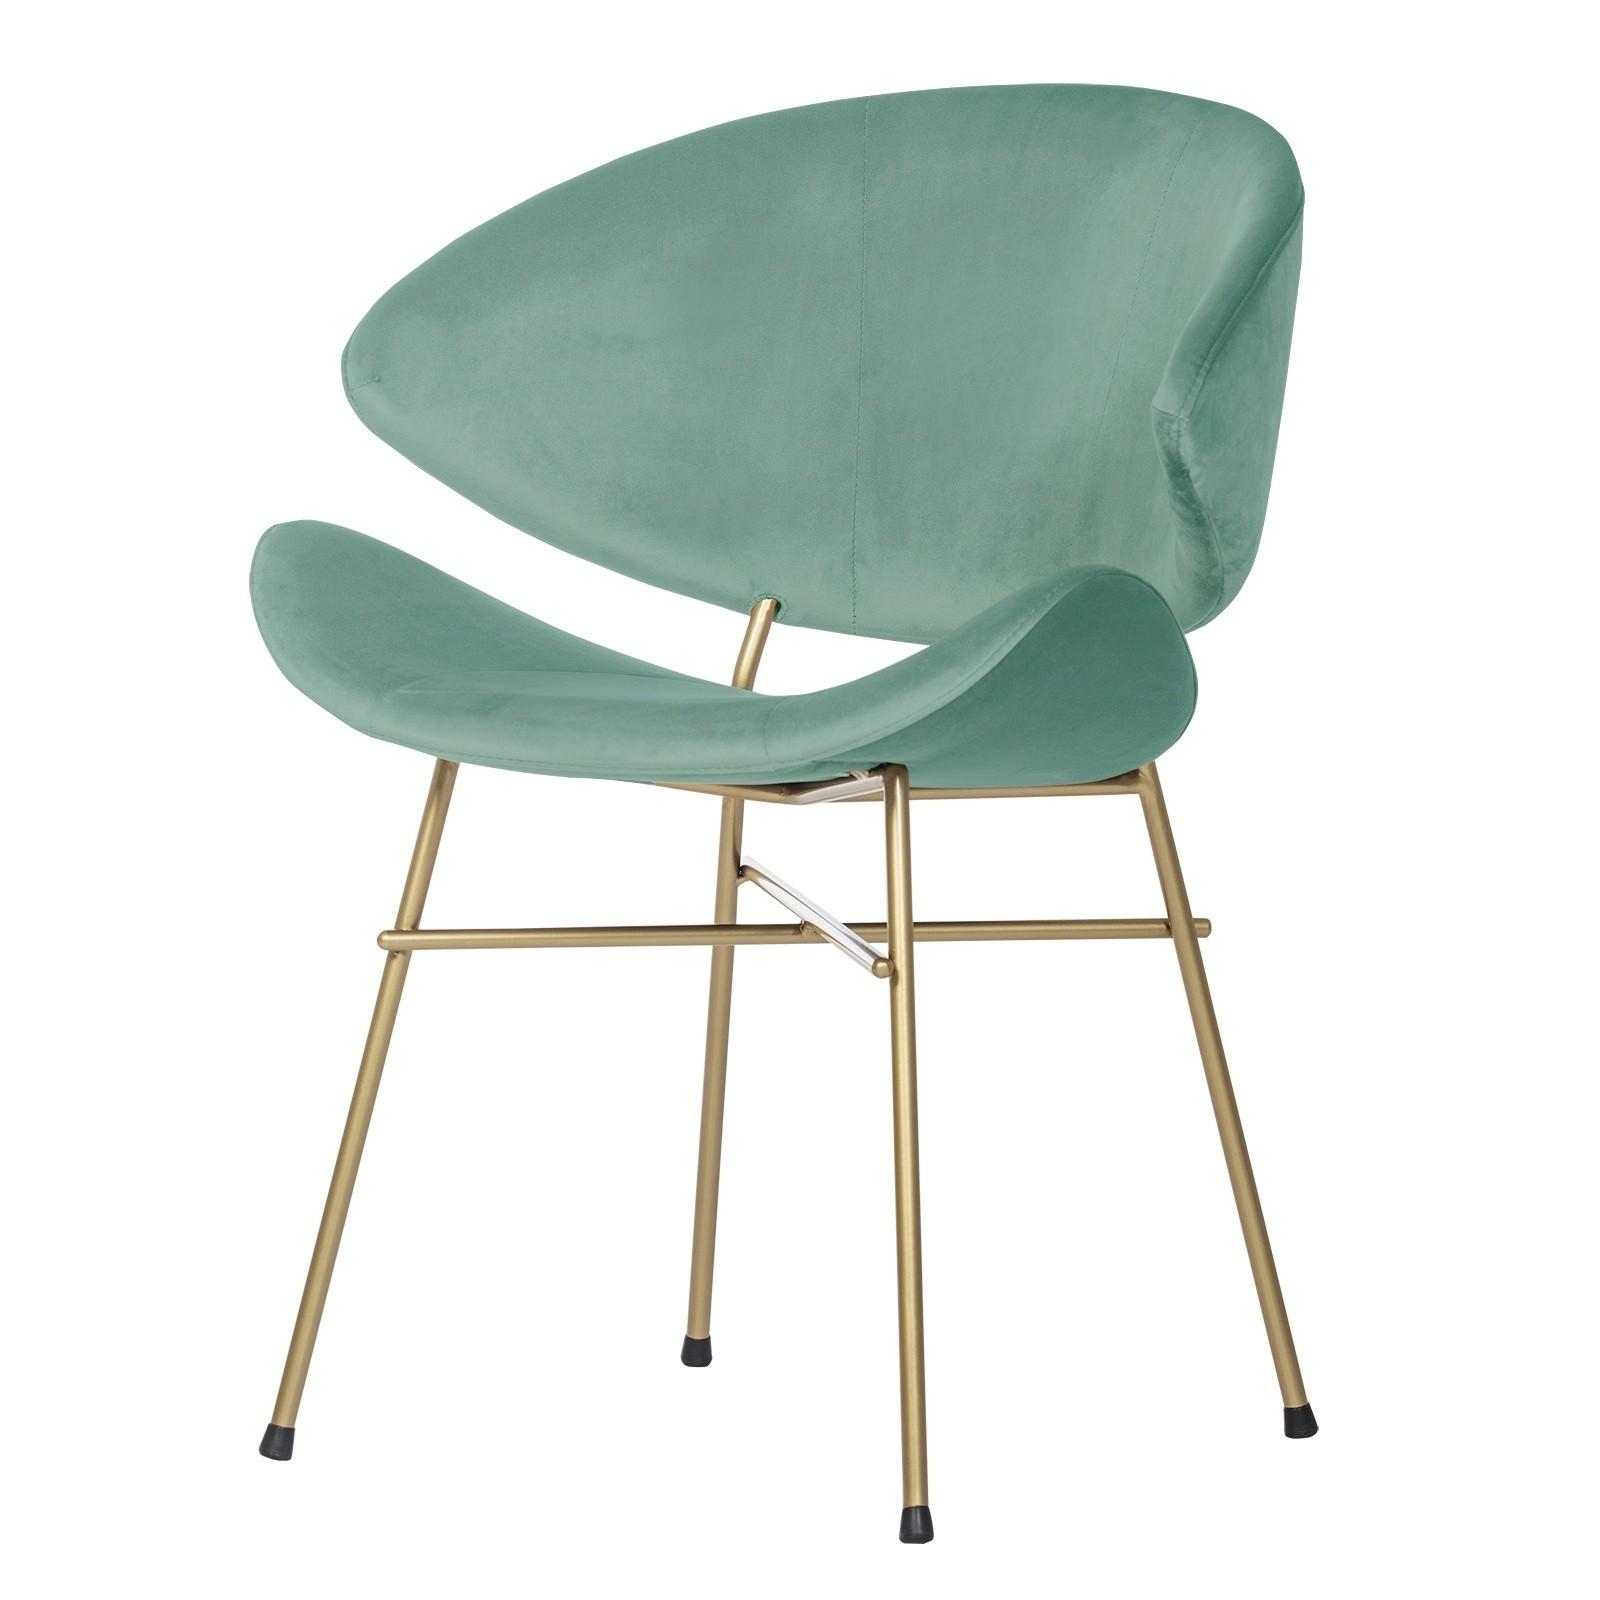 Cheri Gold - velours - chair - mint